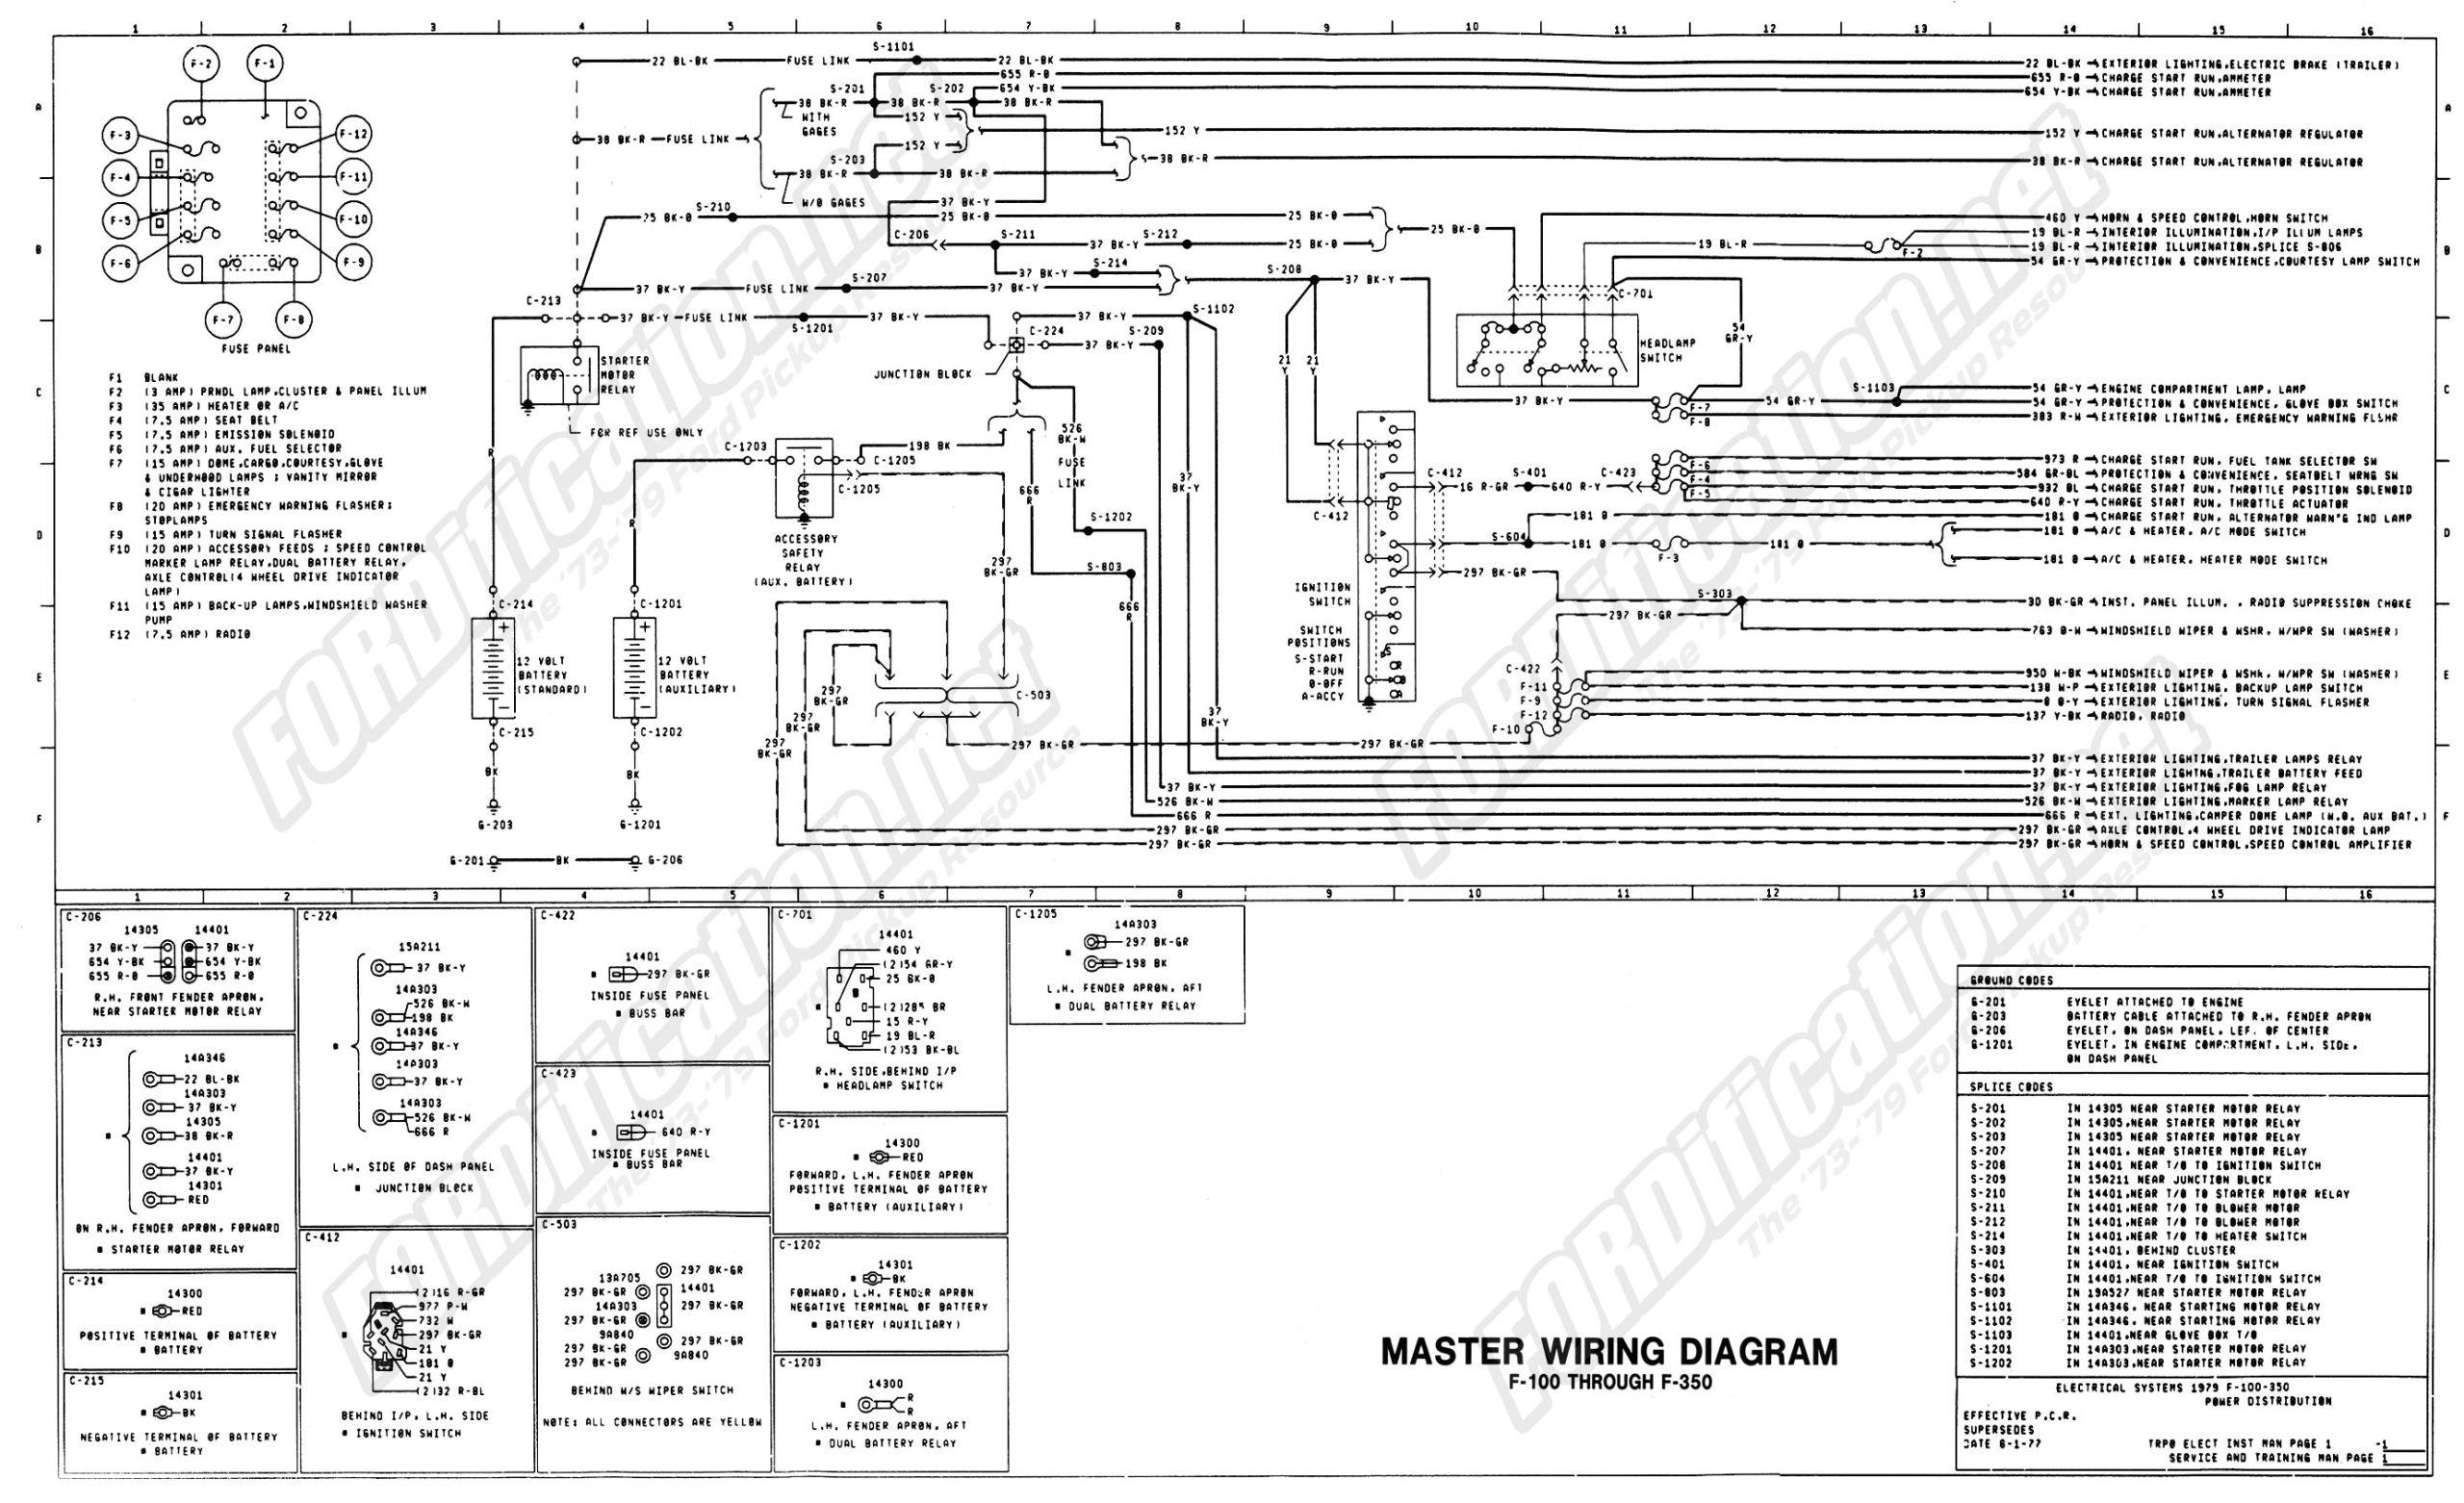 wiring 79master 1of9 jpg